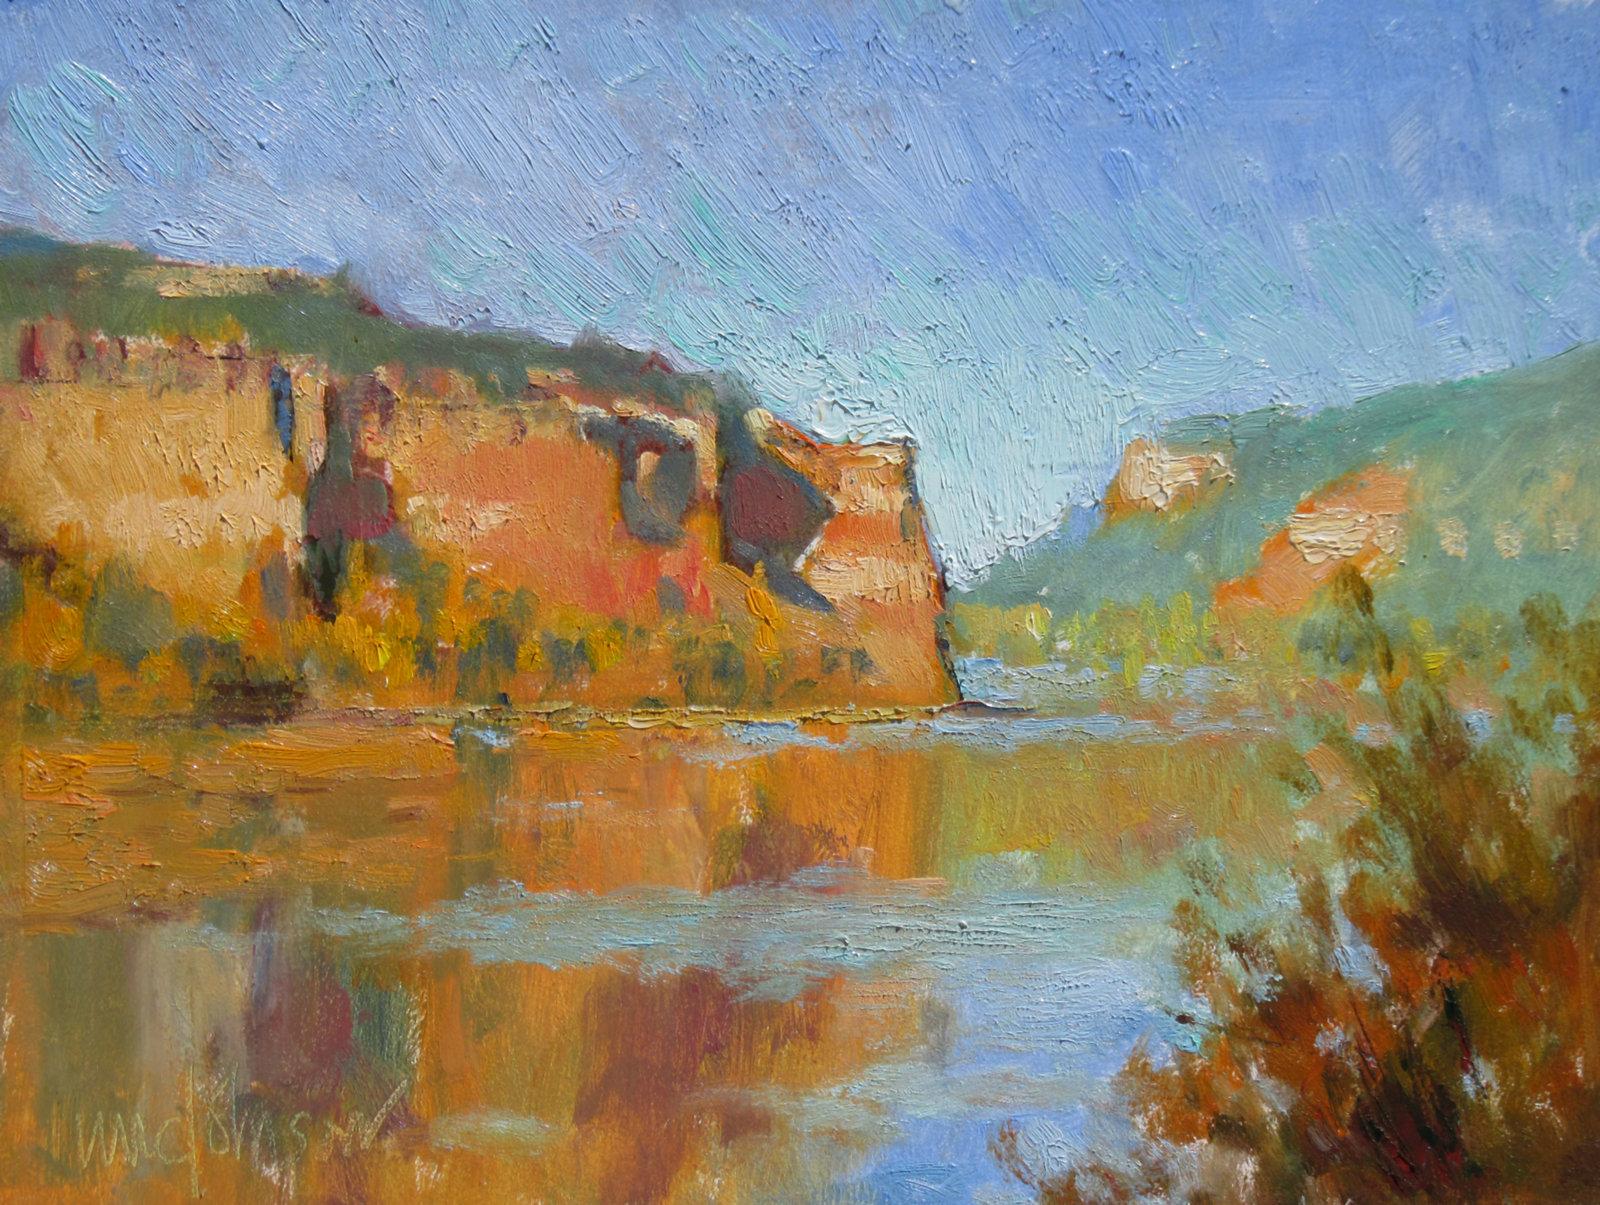 Secret Cliffs - Michael Chesley Johnson